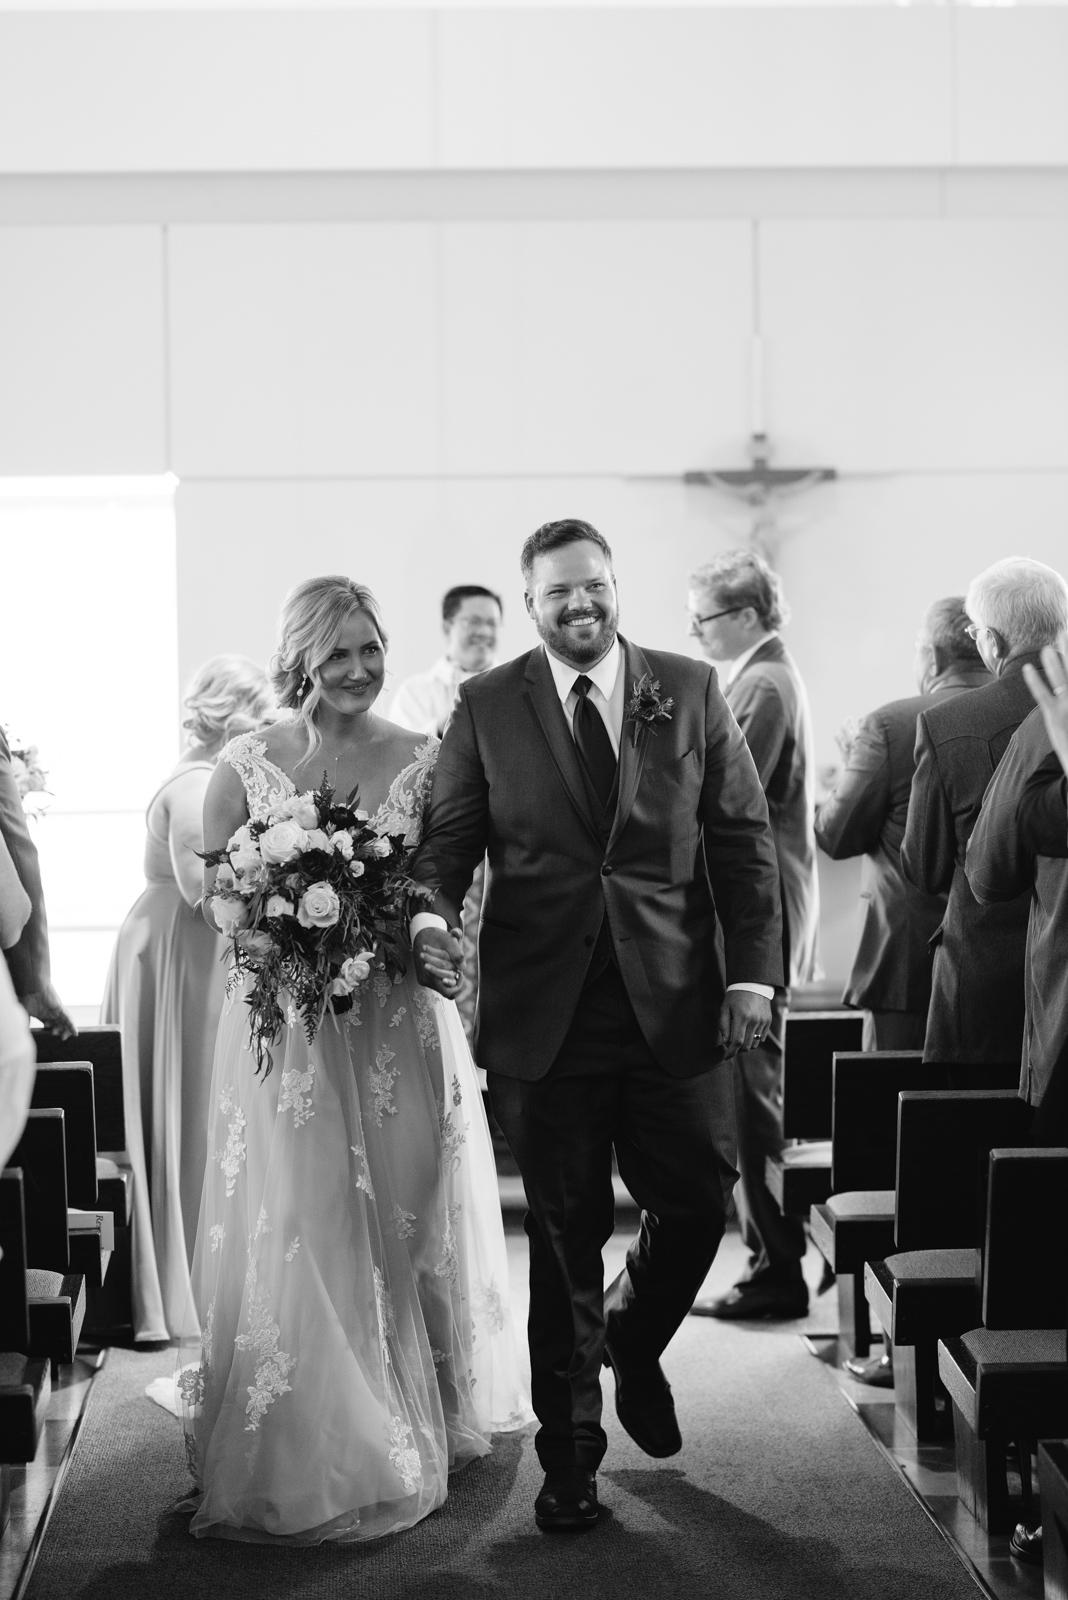 bride and groom walking down aisle St. John XXIII Parish wedding ceremony